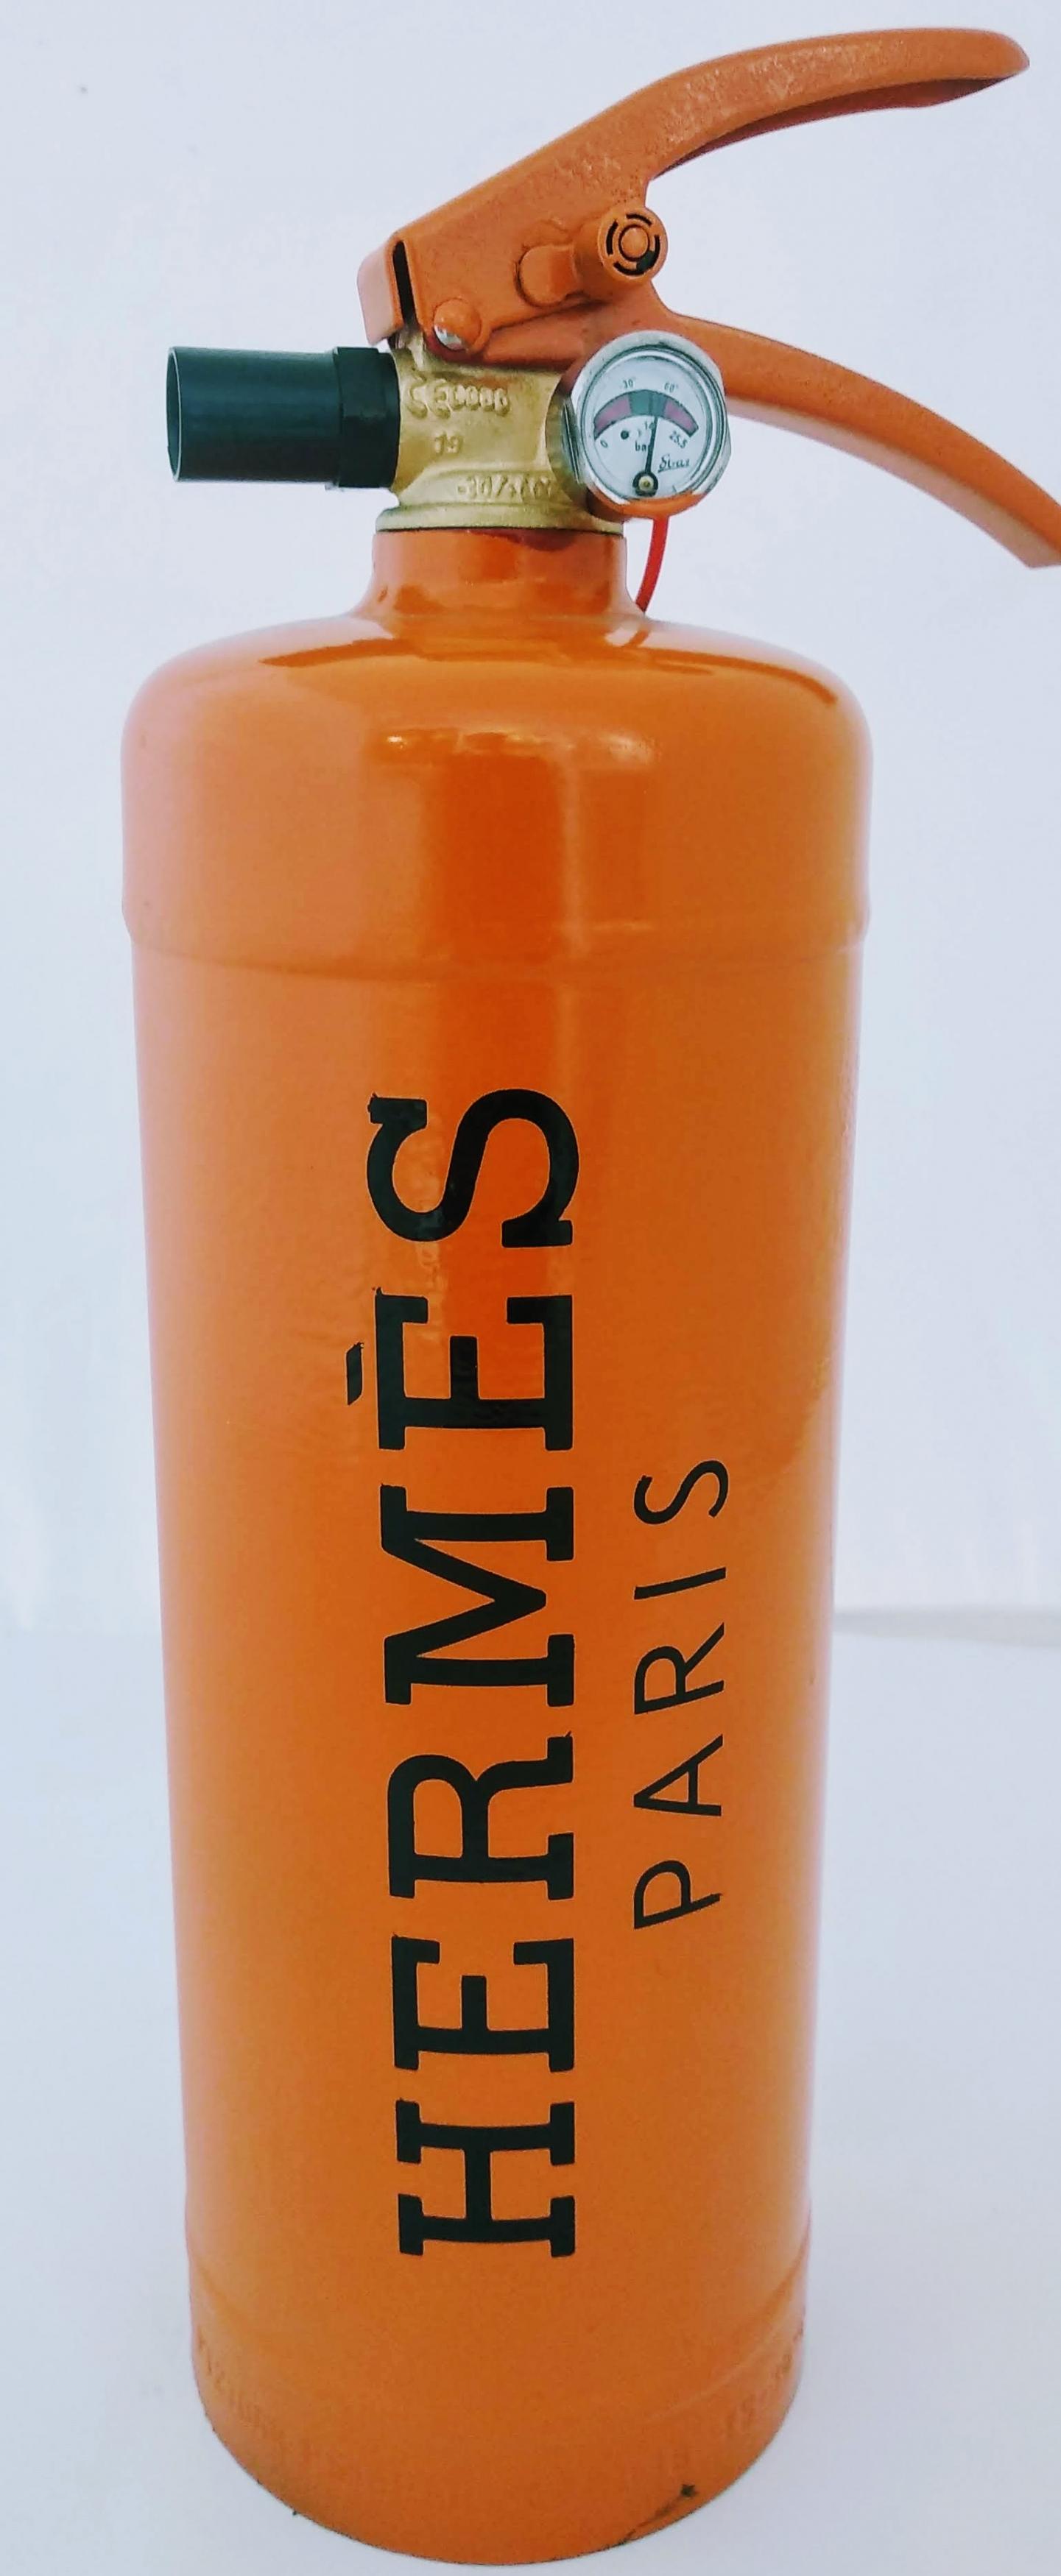 Extinguisher Hermes